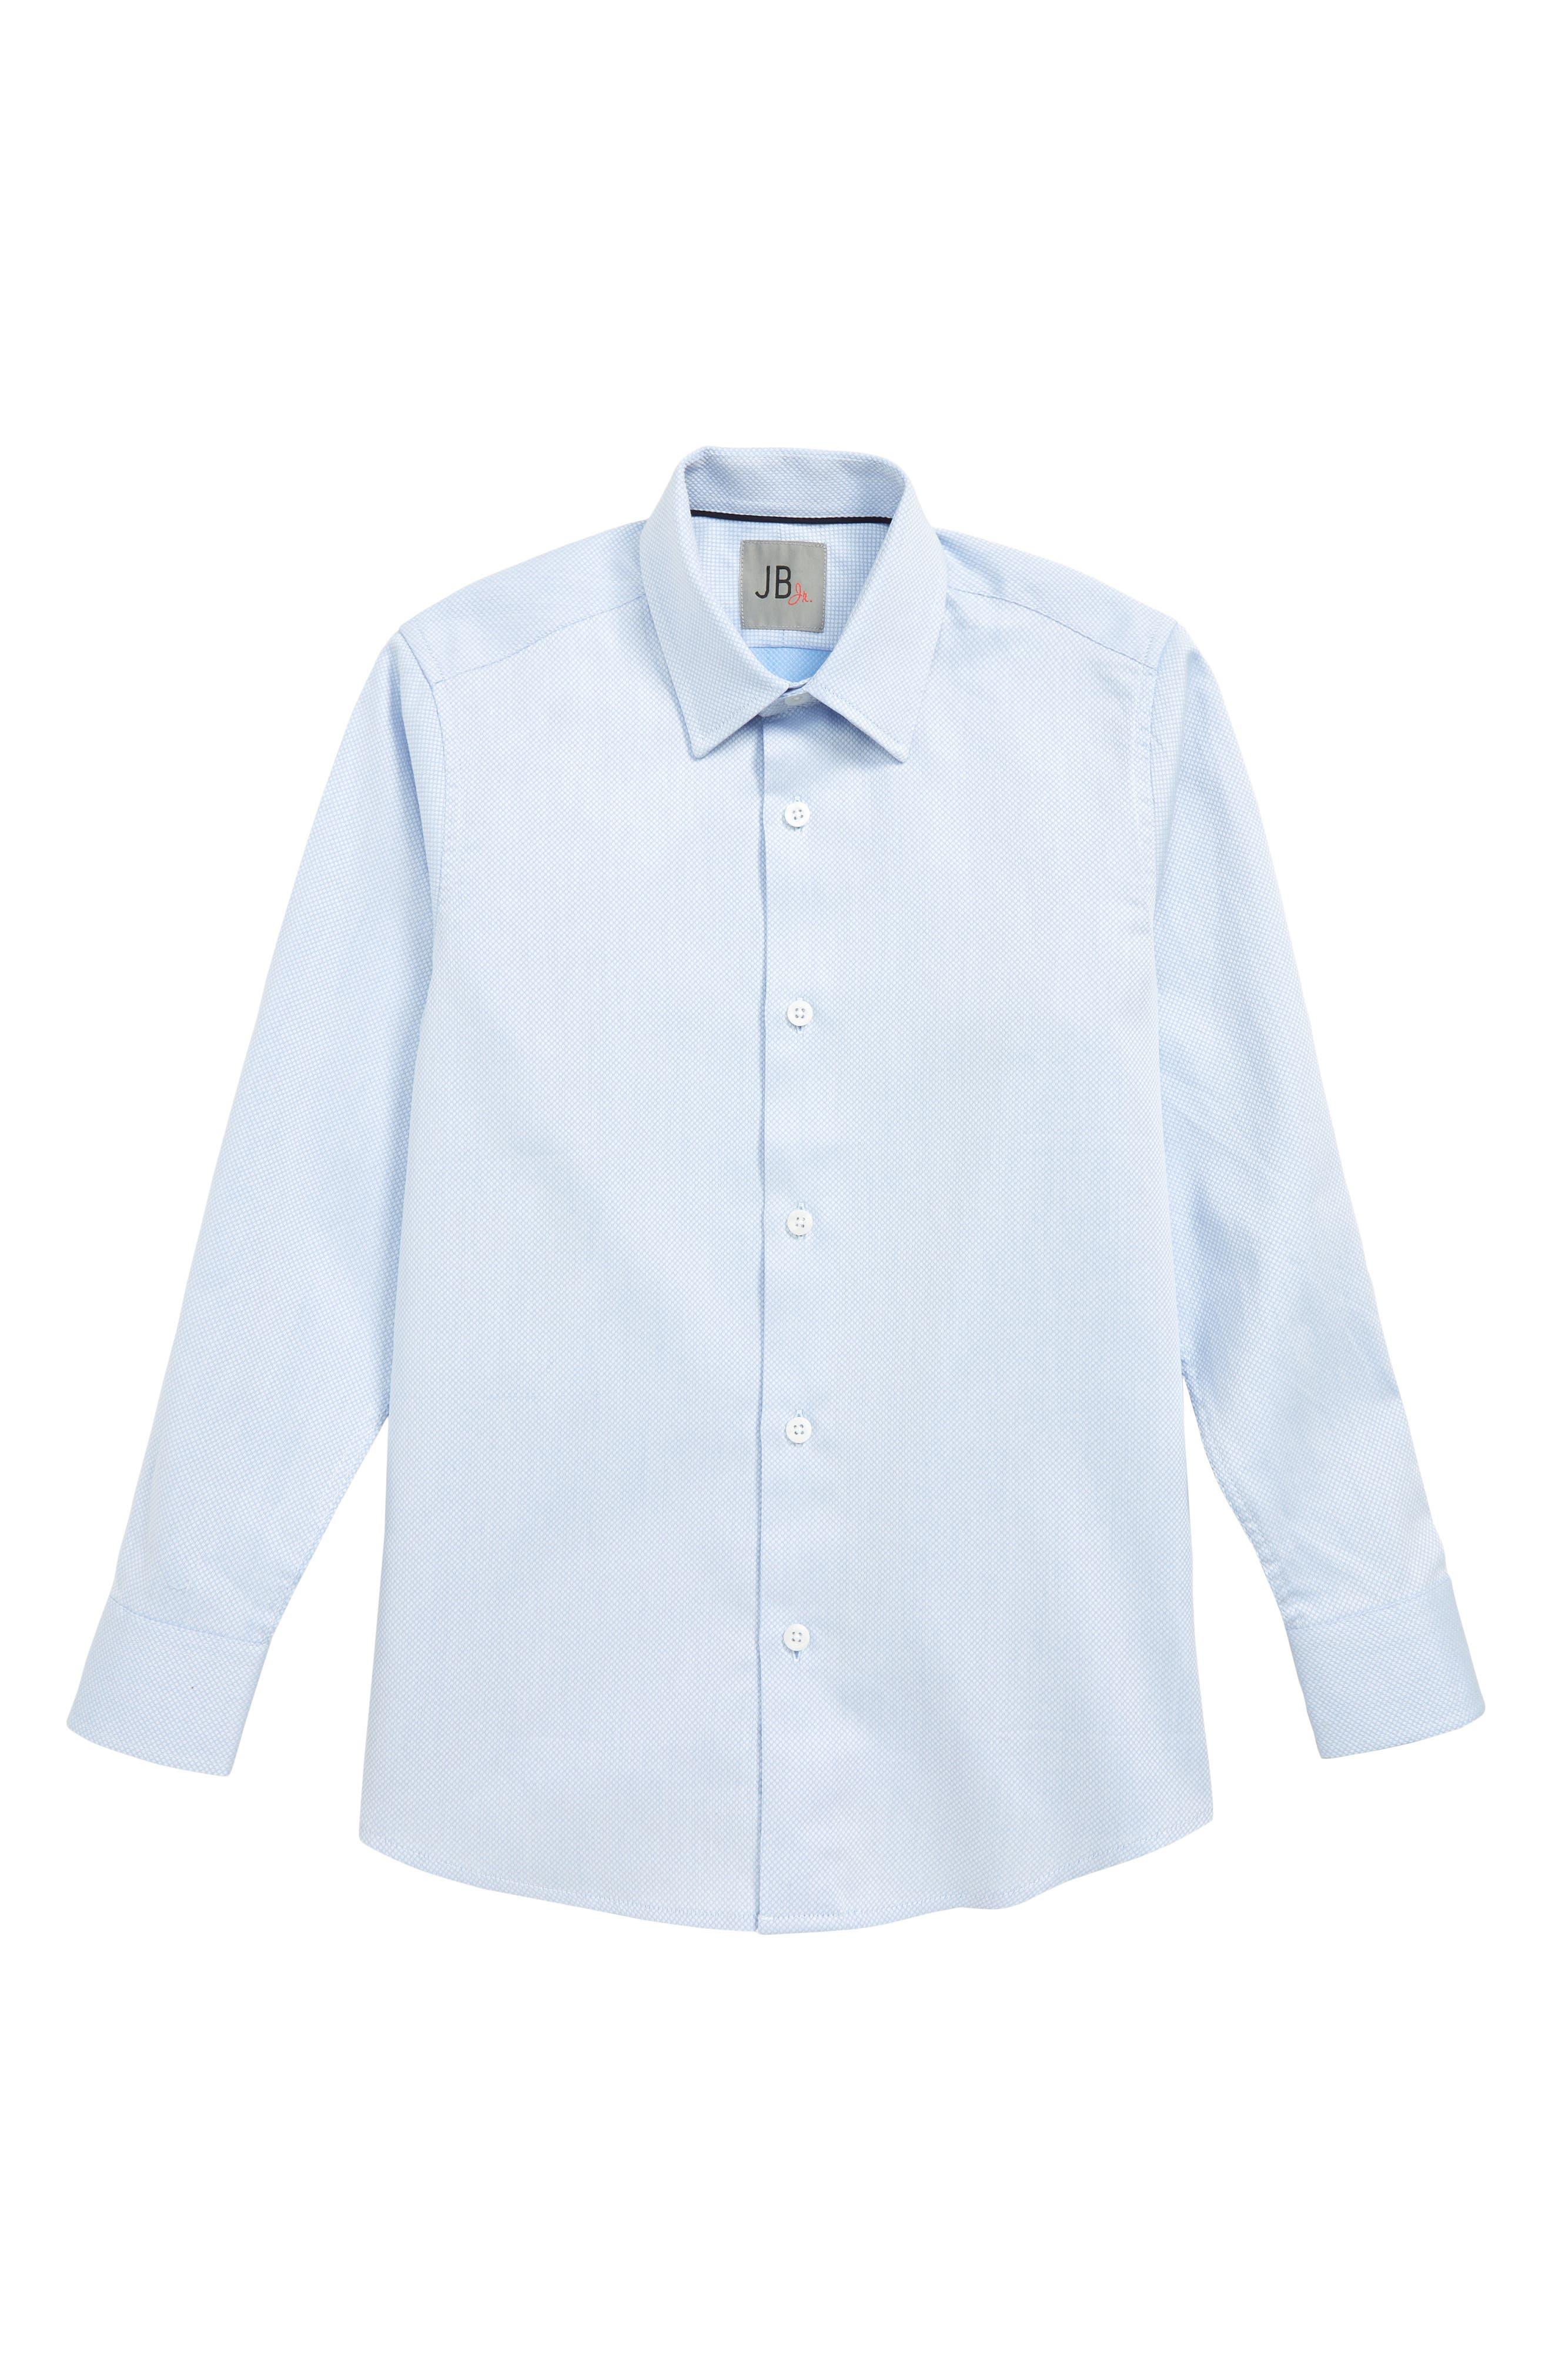 Textured Dress Shirt, Main, color, BLUE